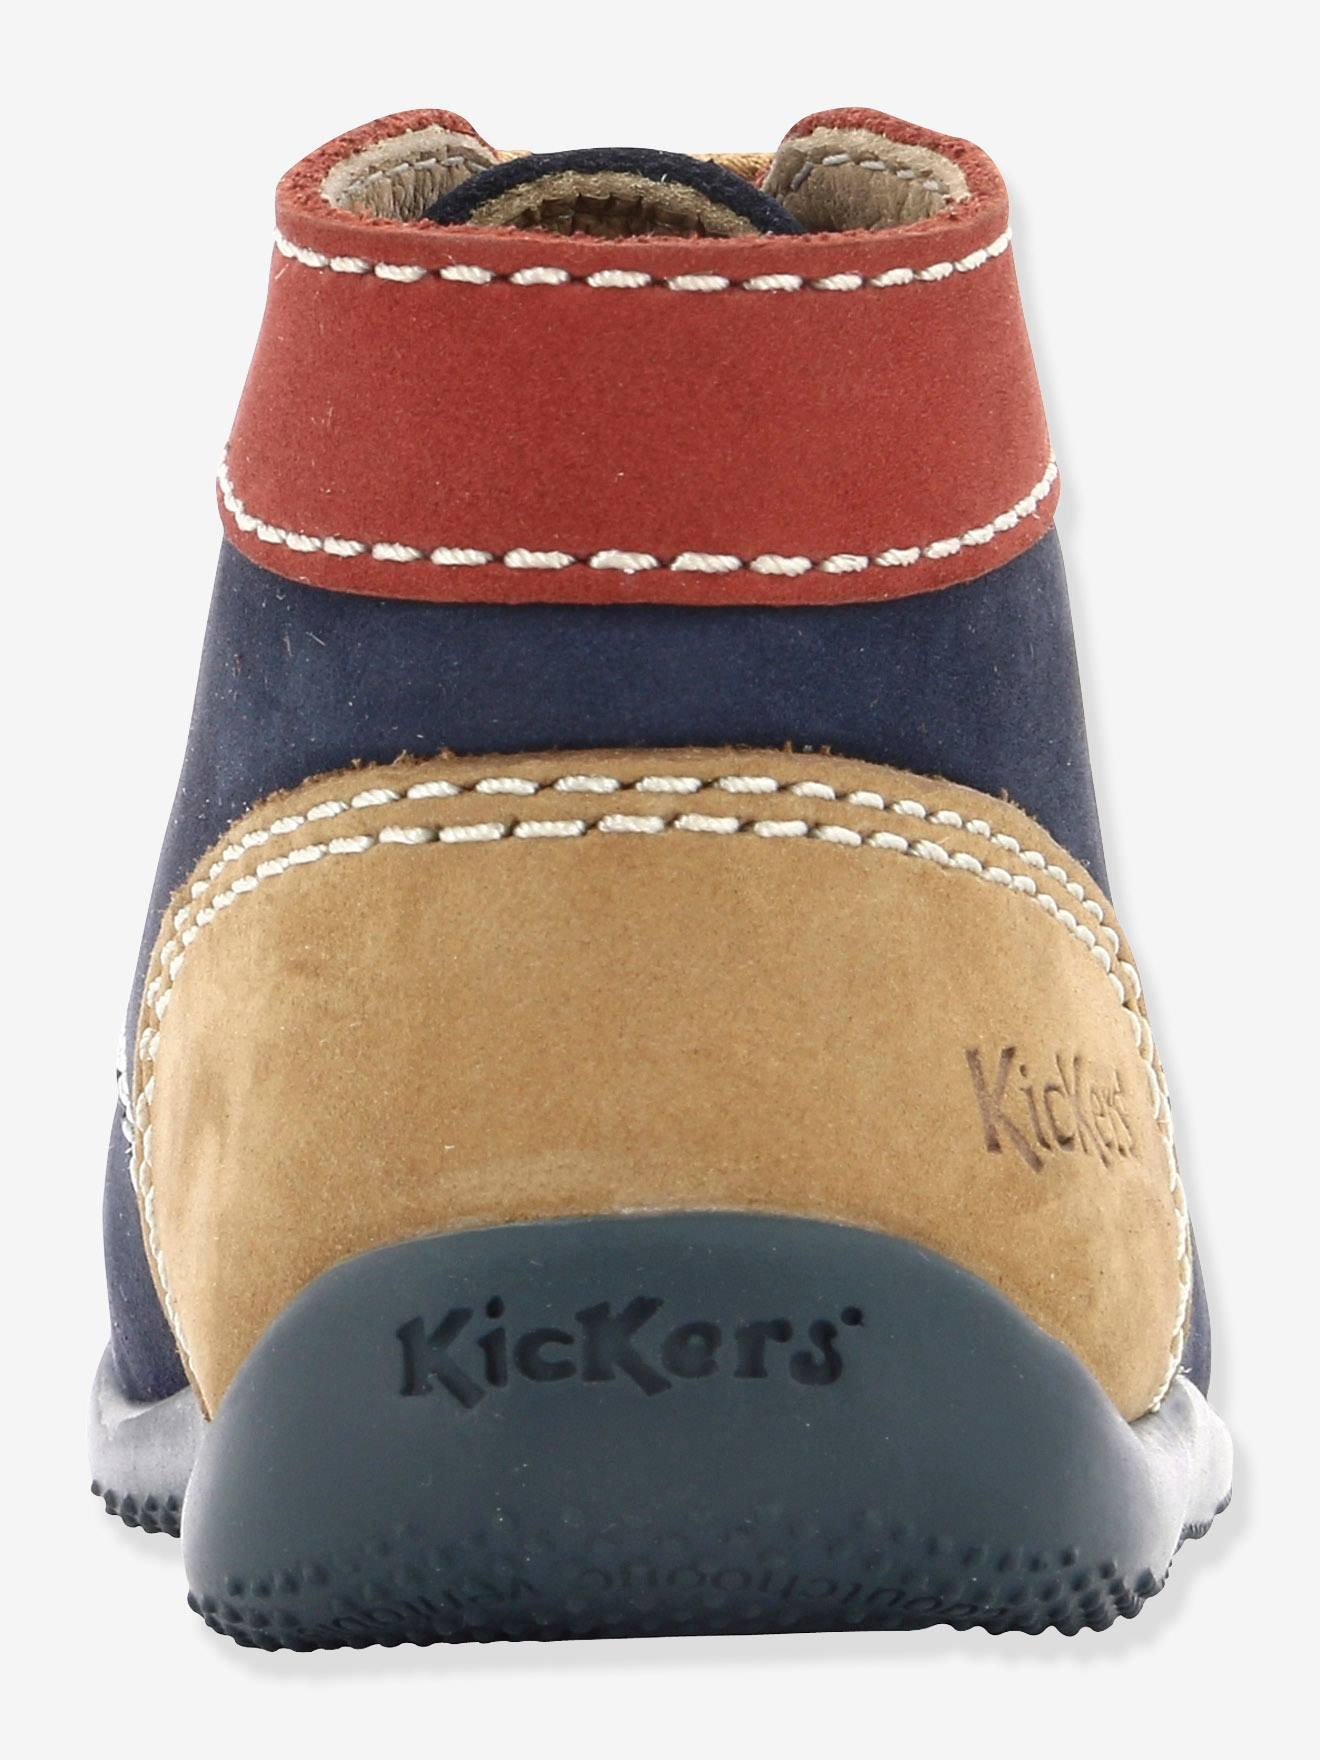 3e2e45689c88b Premiers Kickers® Bottillons Bébé Garçon Pas Kickers Bonbon wqO6xU